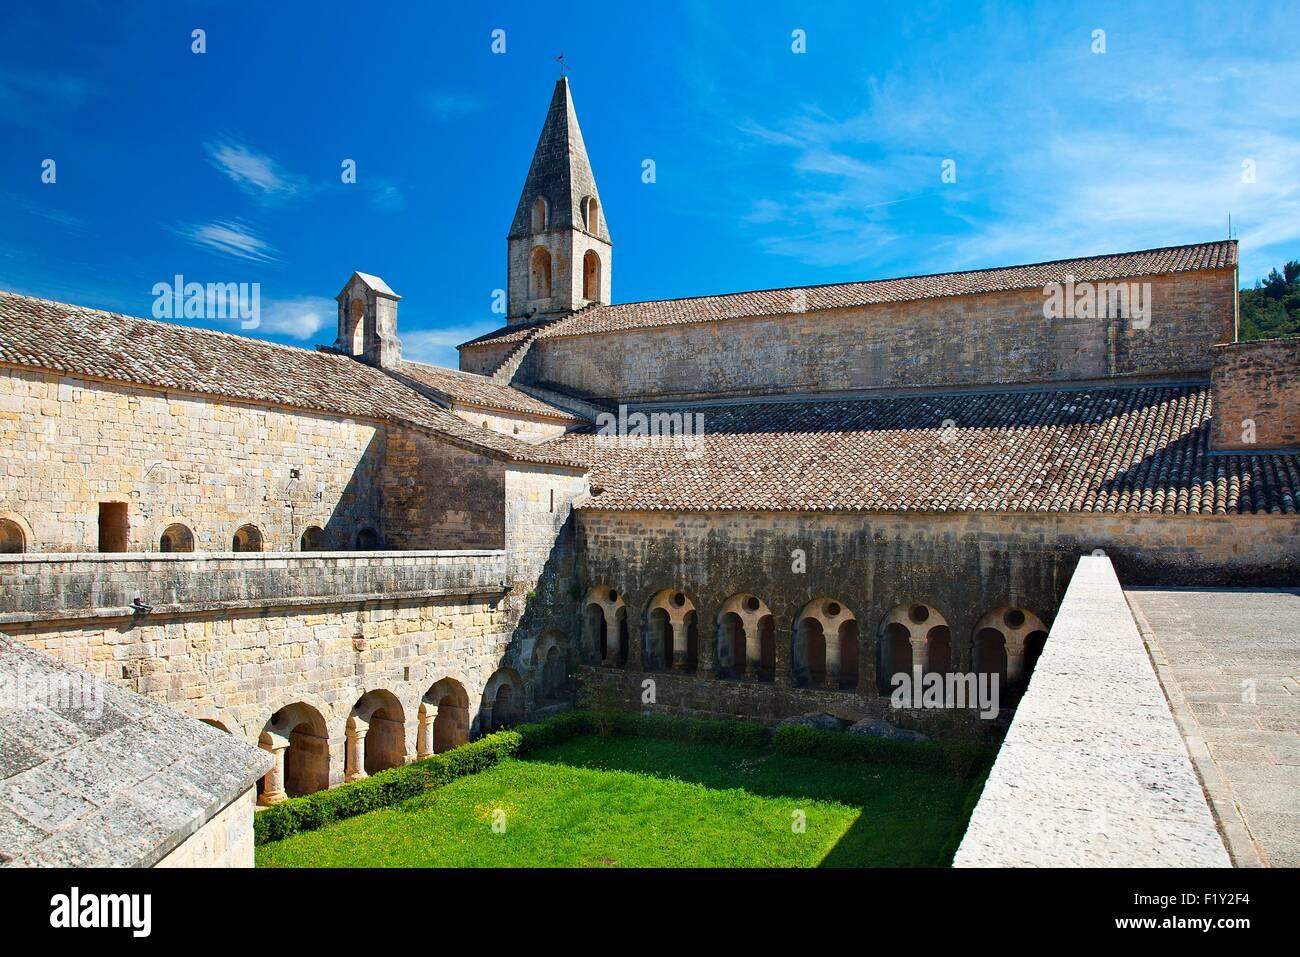 France, Var, Cistercian Abbey of Thoronet - Stock Image